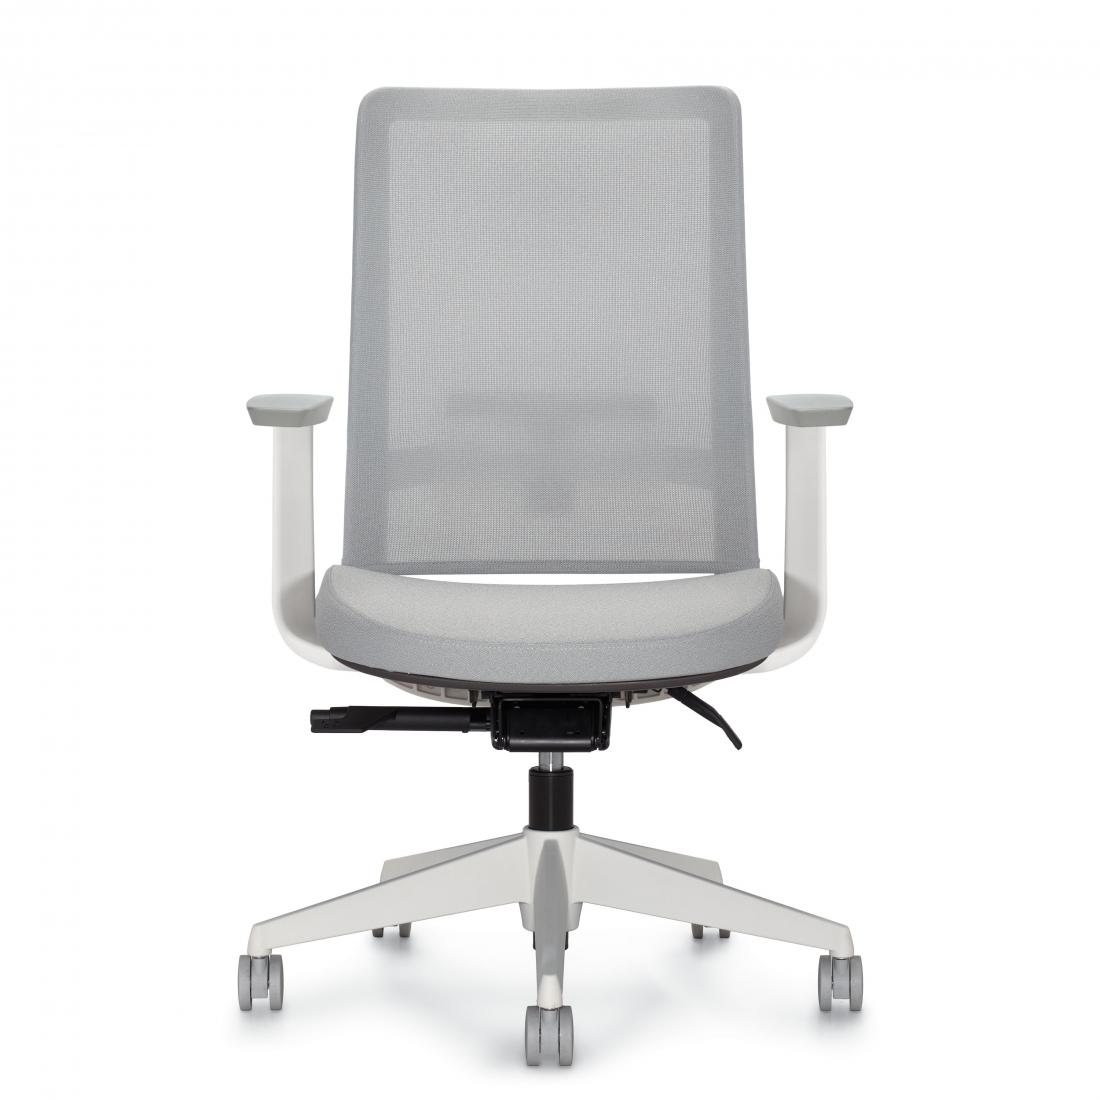 global factor high back chair model 5540